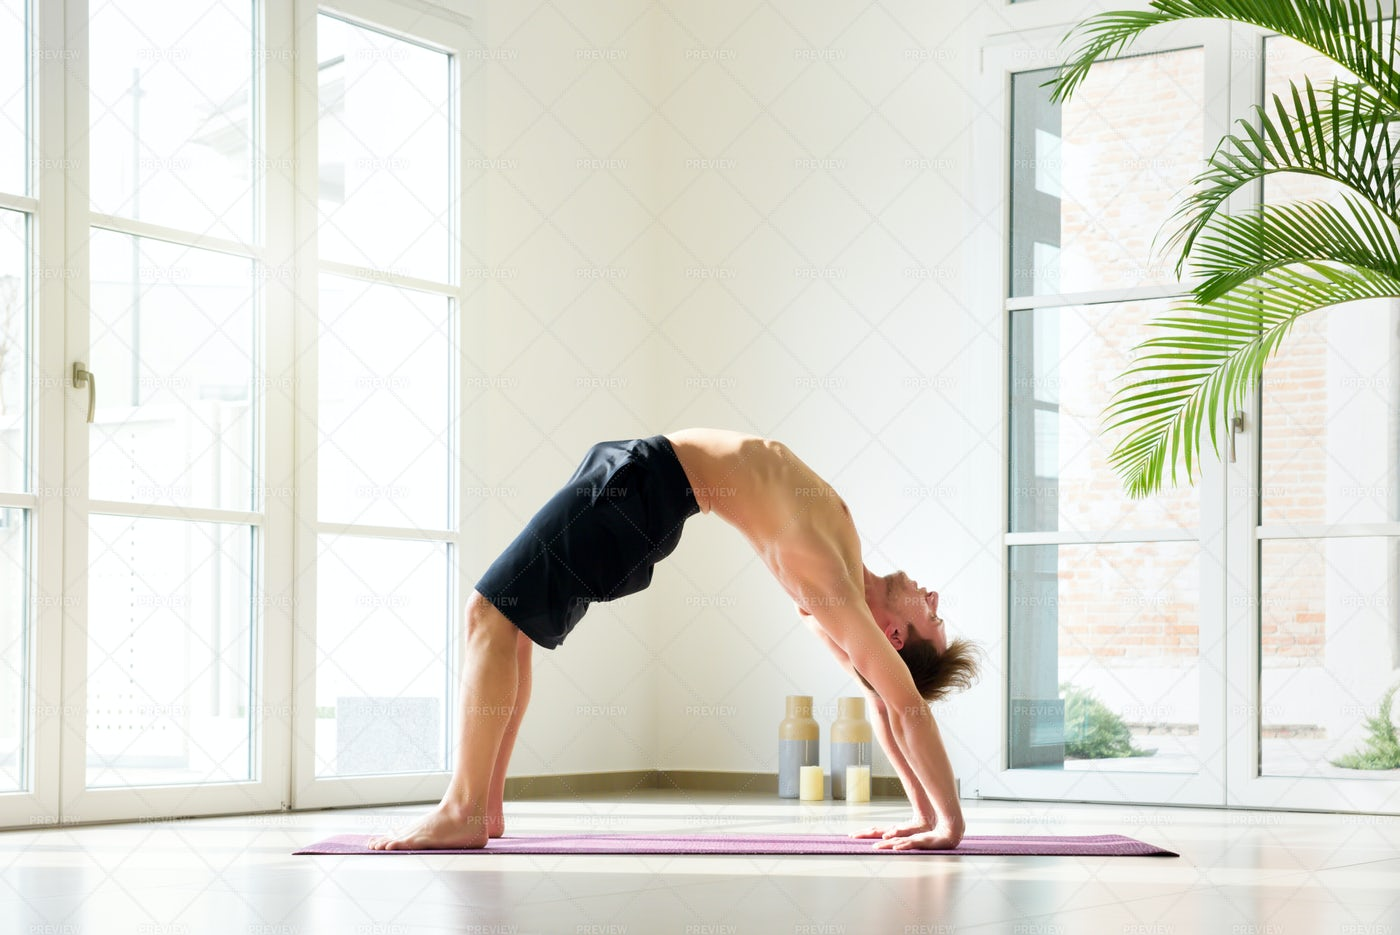 Man Practicing Yoga At Home: Stock Photos